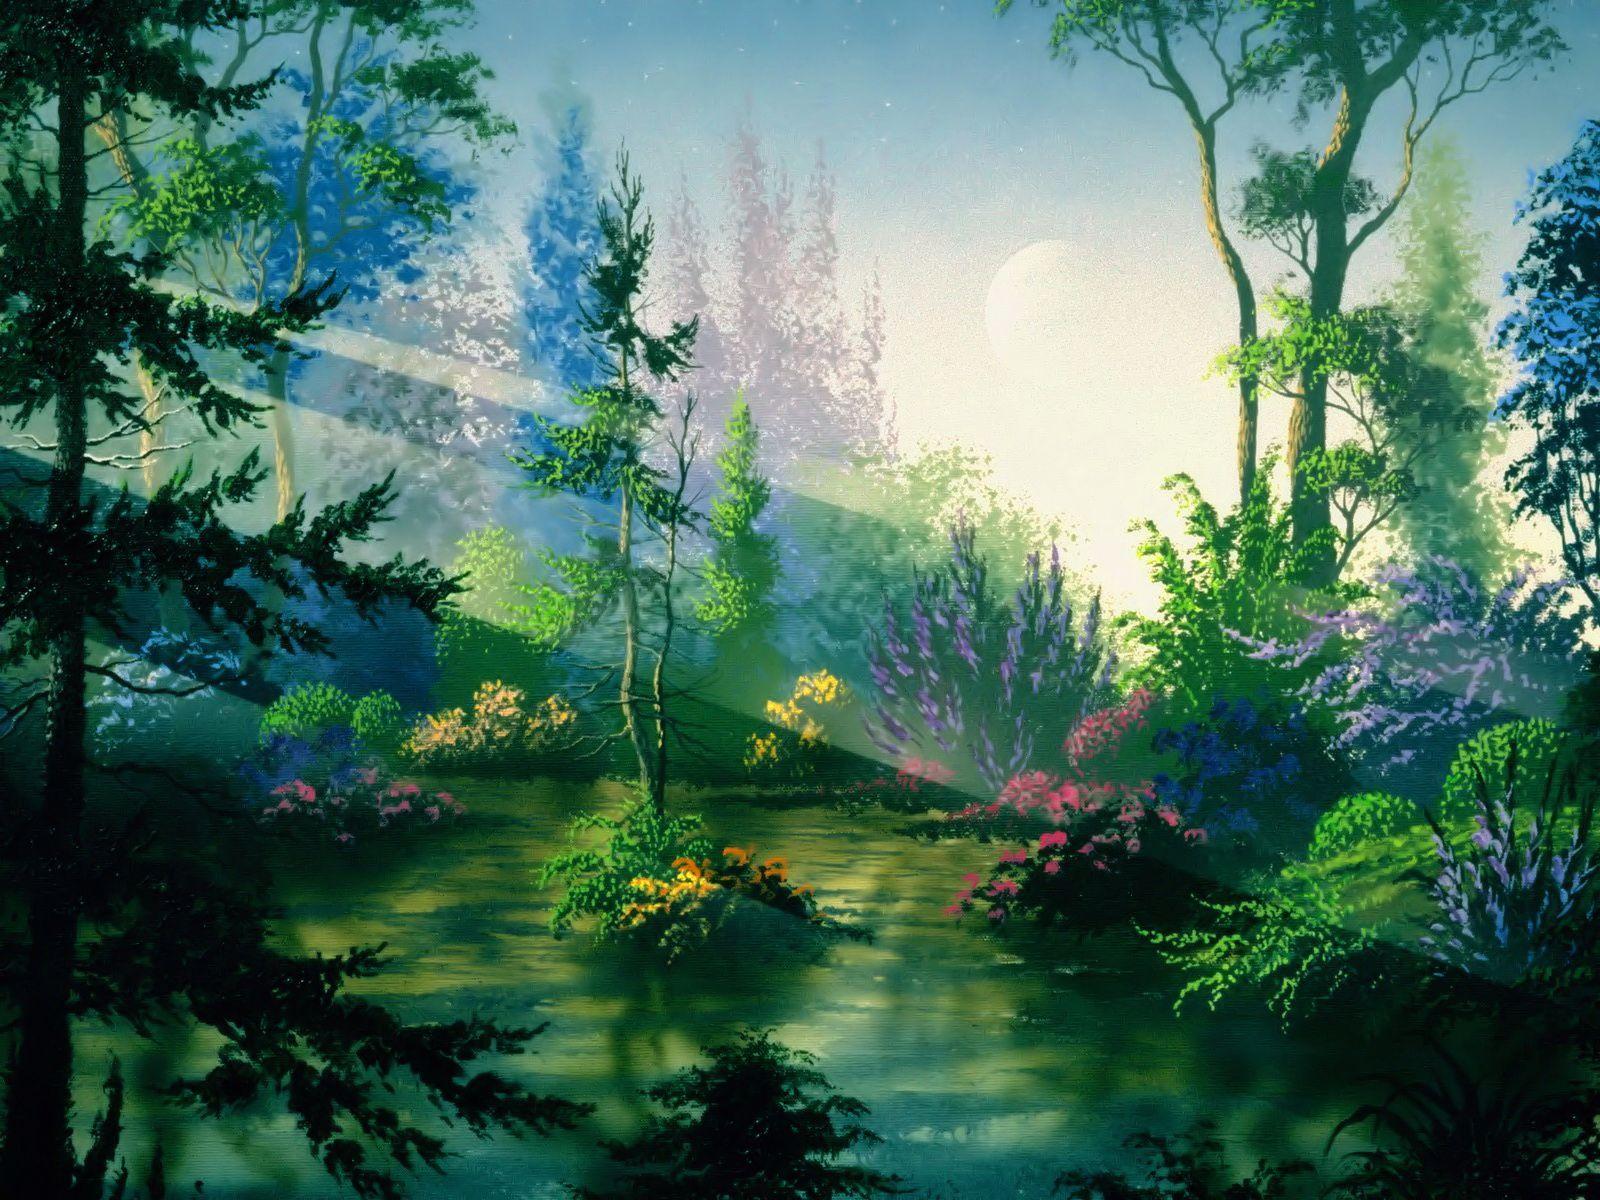 Fantasy Photo Fantasy Forest Scenery Wallpaper Fantasy Landscape Anime Scenery